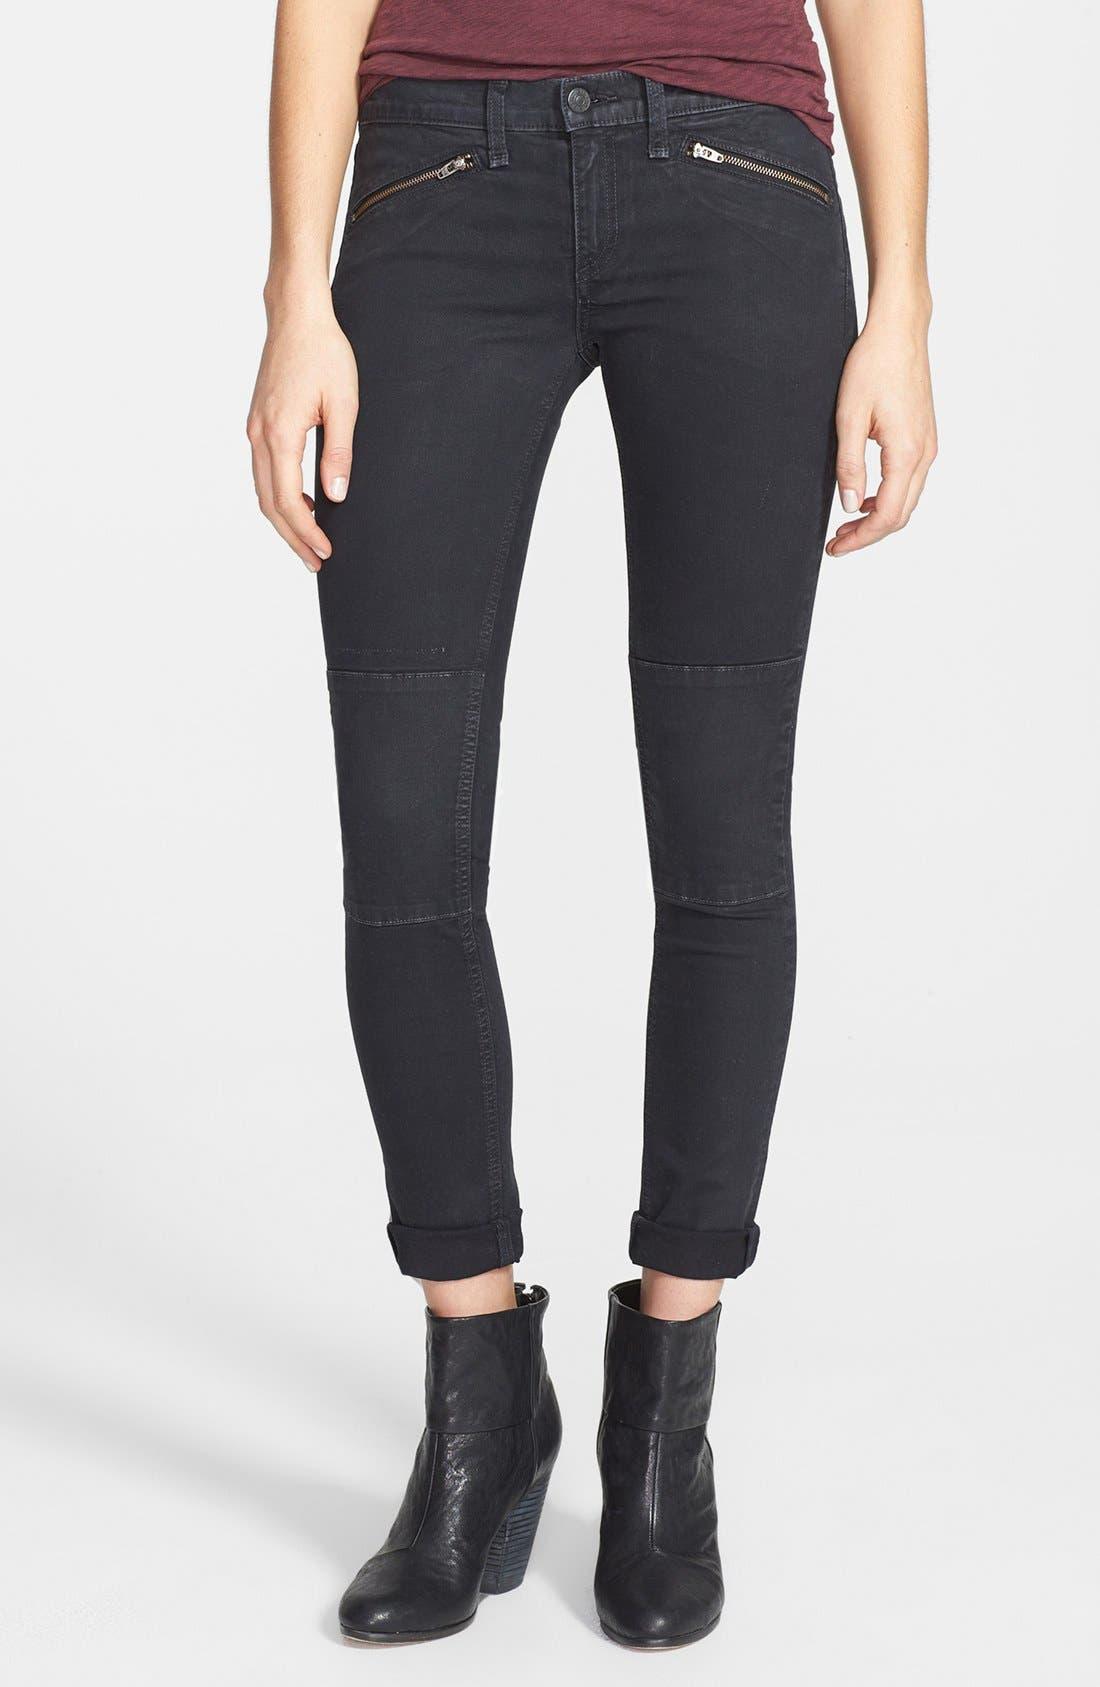 Main Image - rag & bone/JEAN 'Ridley' Moto Skinny Jeans (Wax Black)